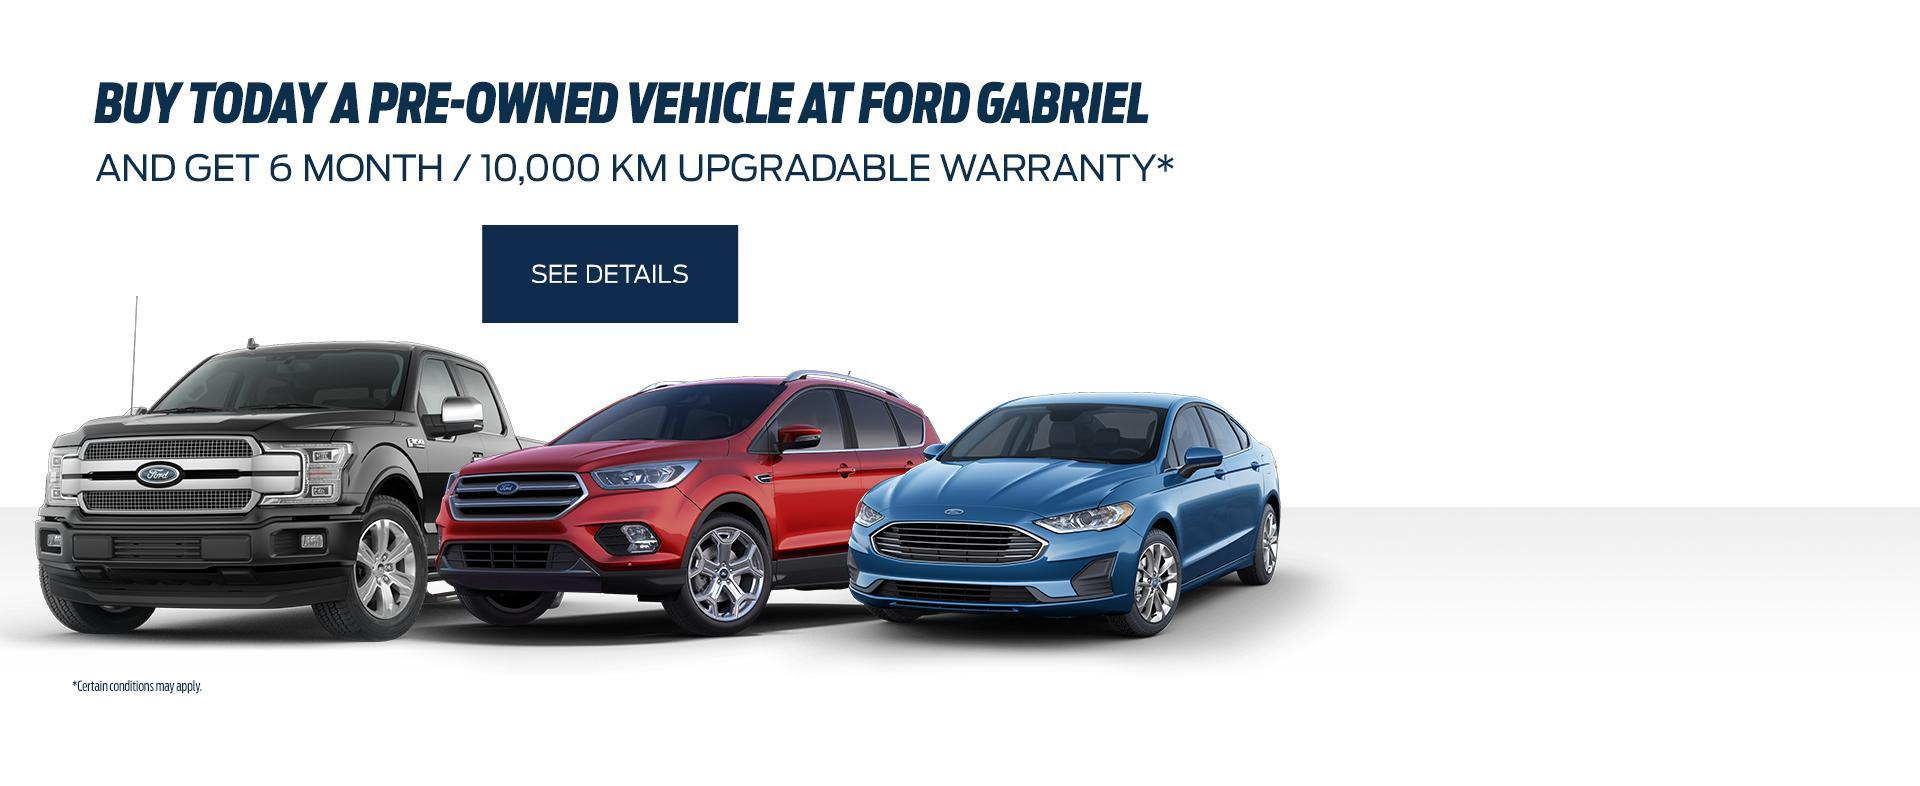 2019 Warranty Promo